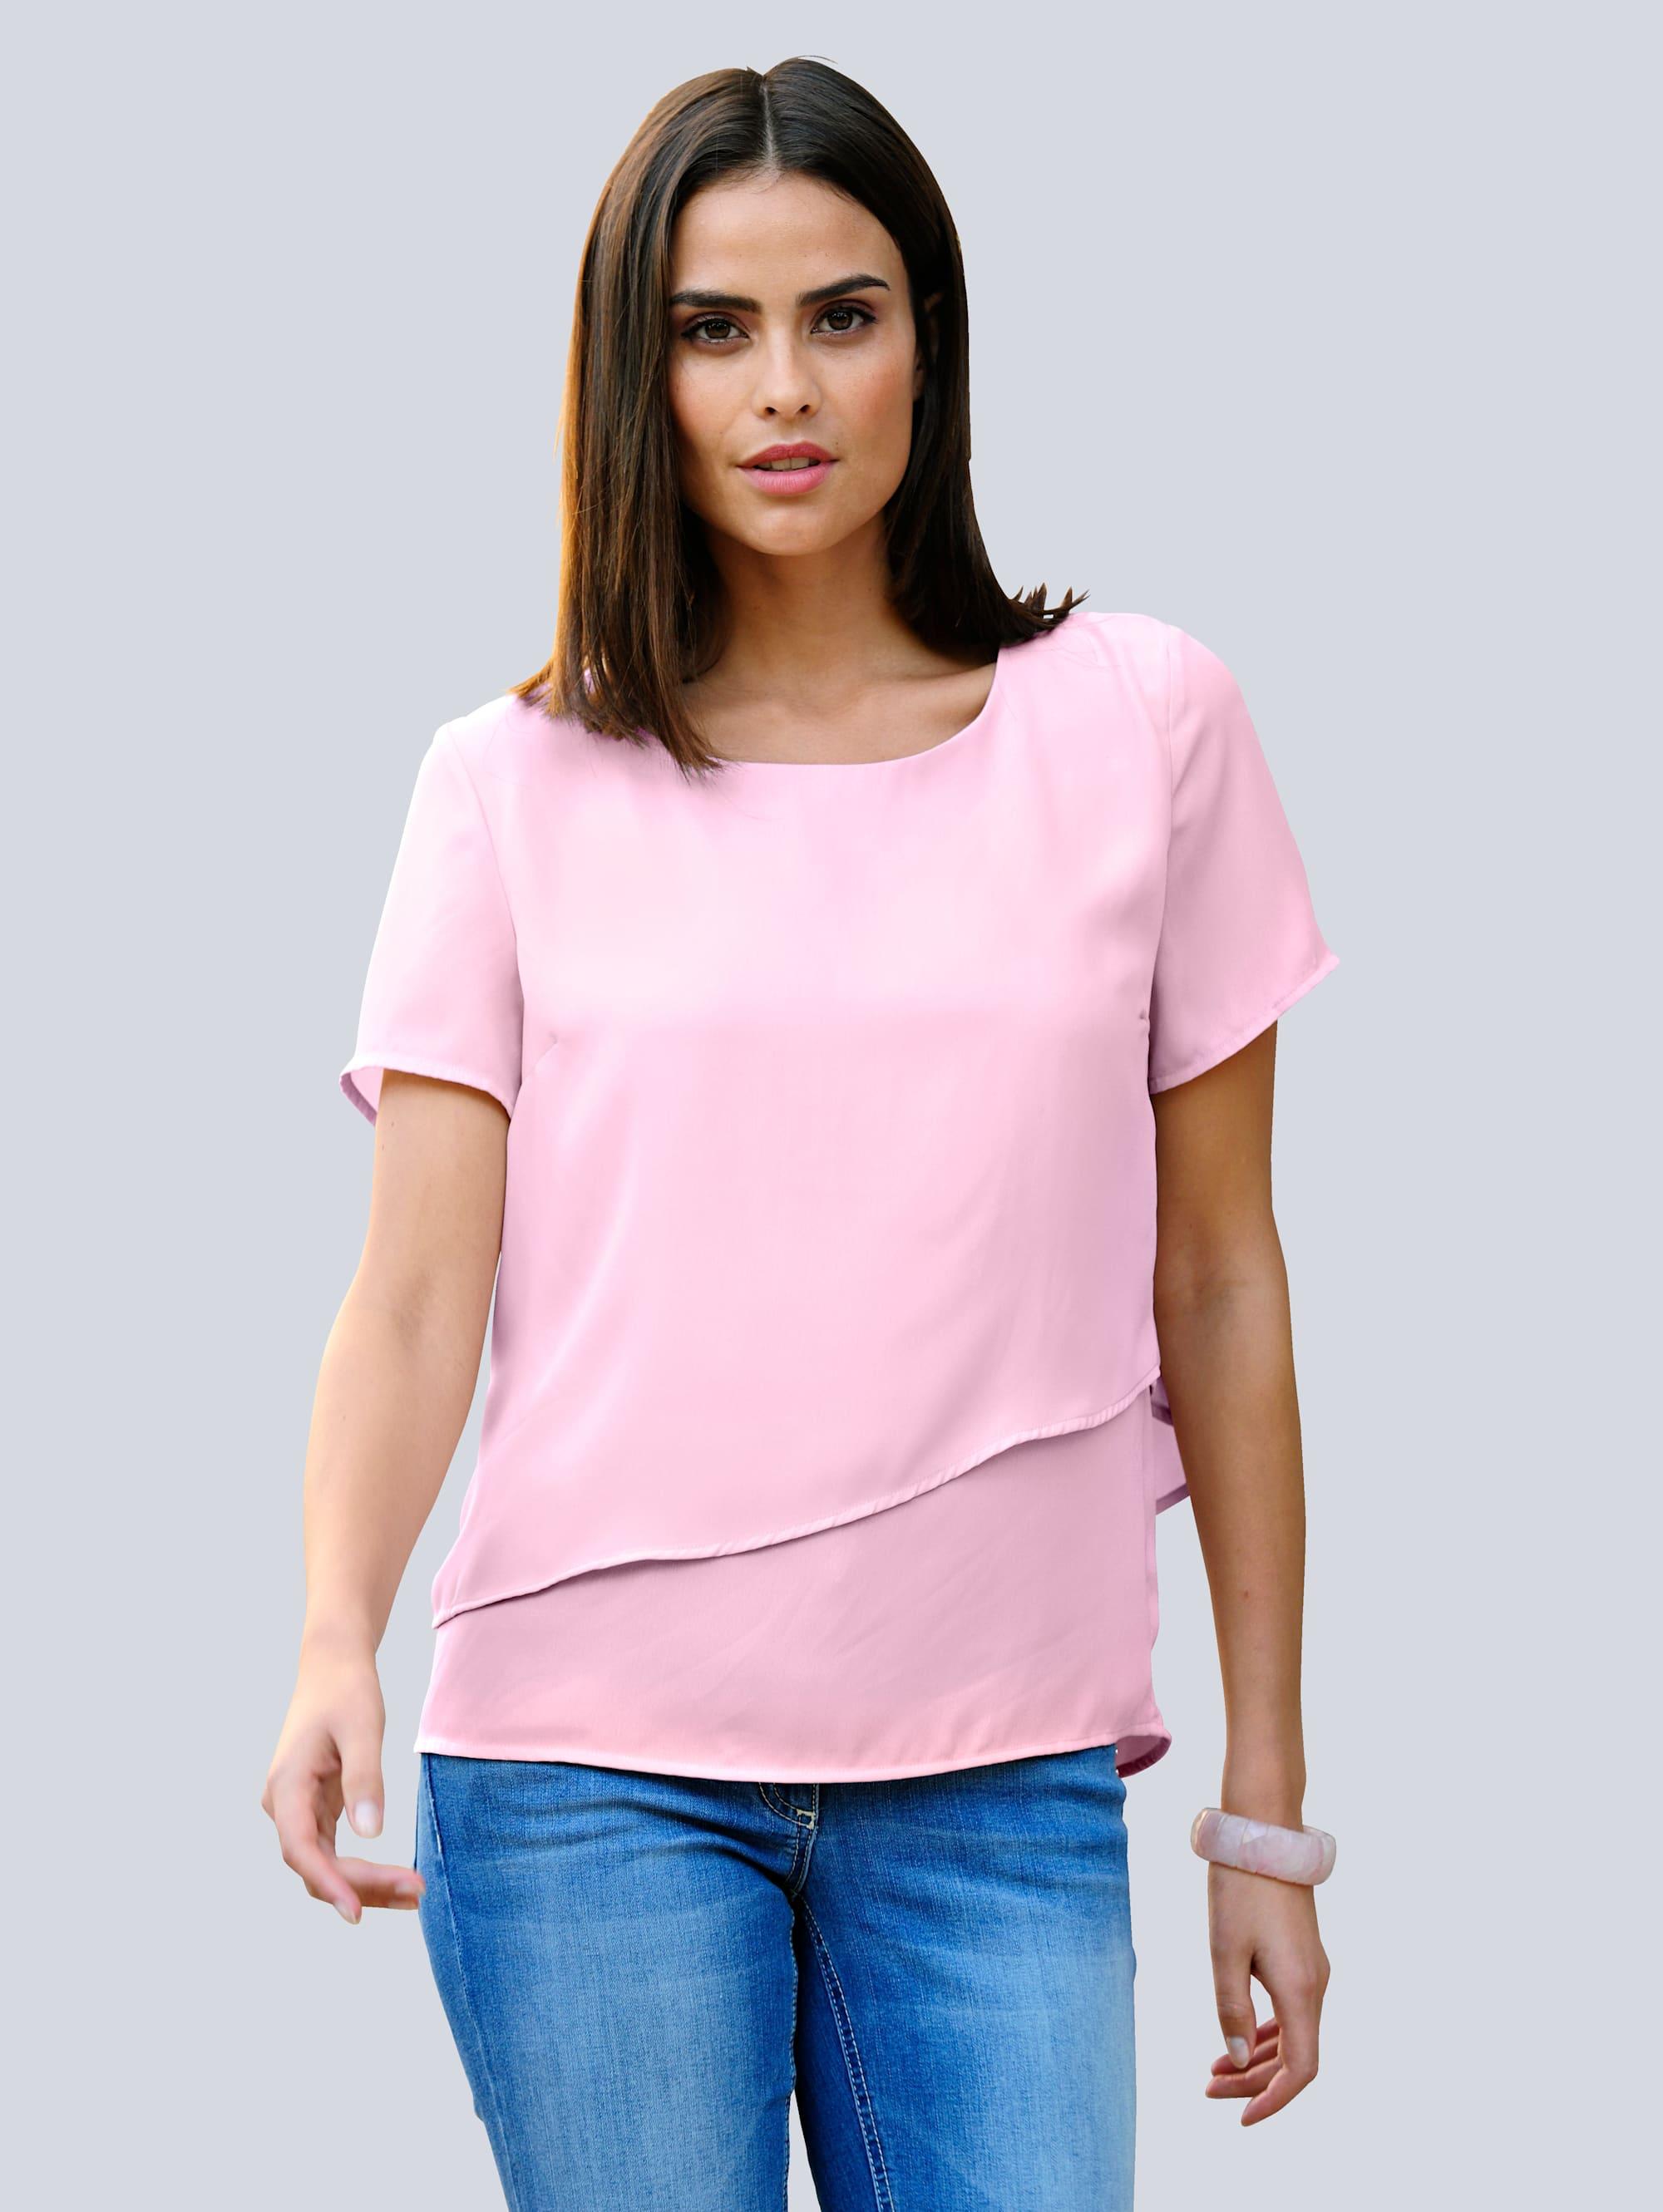 Alba Moda Bluse in sommerlich softer Farbstellung PTXpv HF0Q9